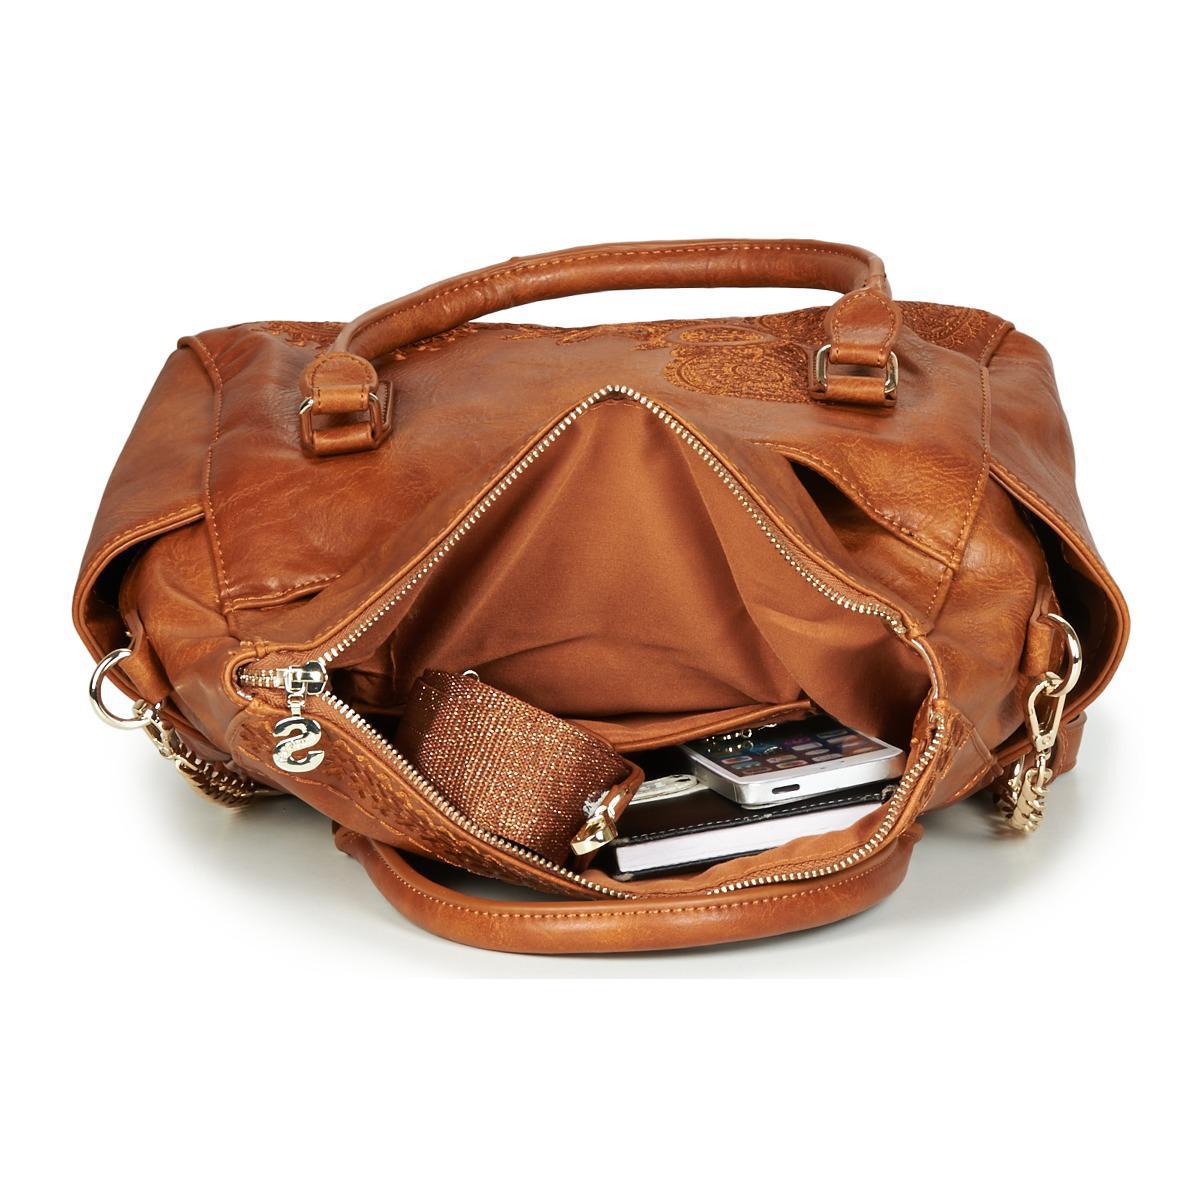 92dc4ed50d8 Desigual Bols Dark Amber Loverty Women s Handbags In Brown in Brown ...